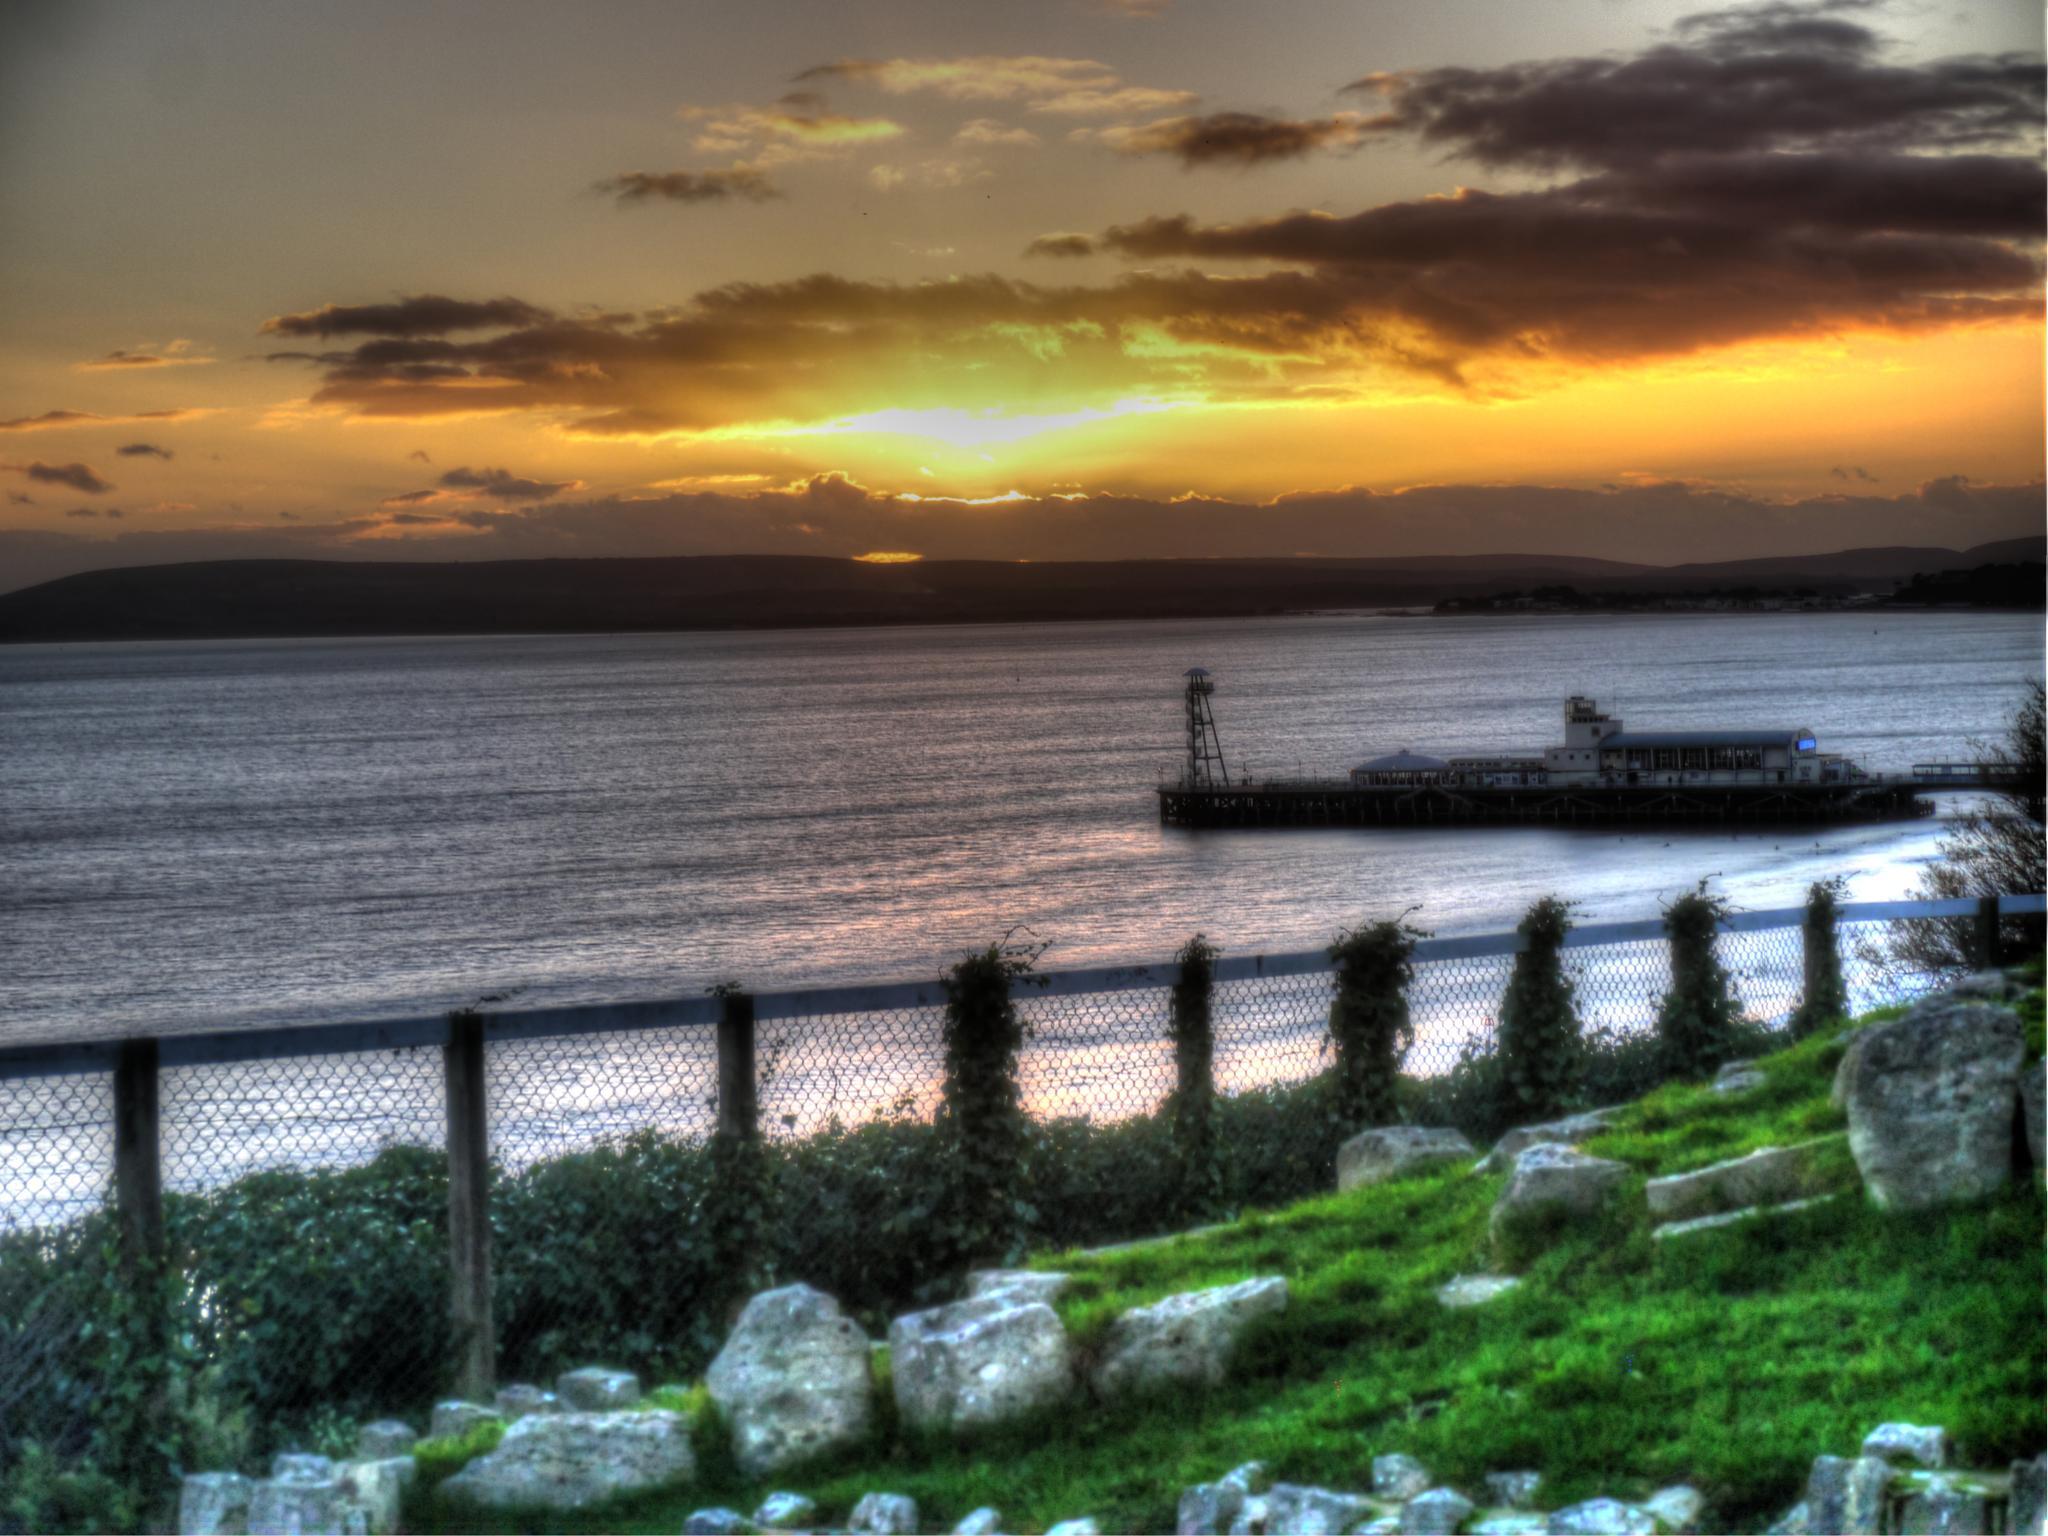 By the Sea Bournemouth, England by AuntyLynn